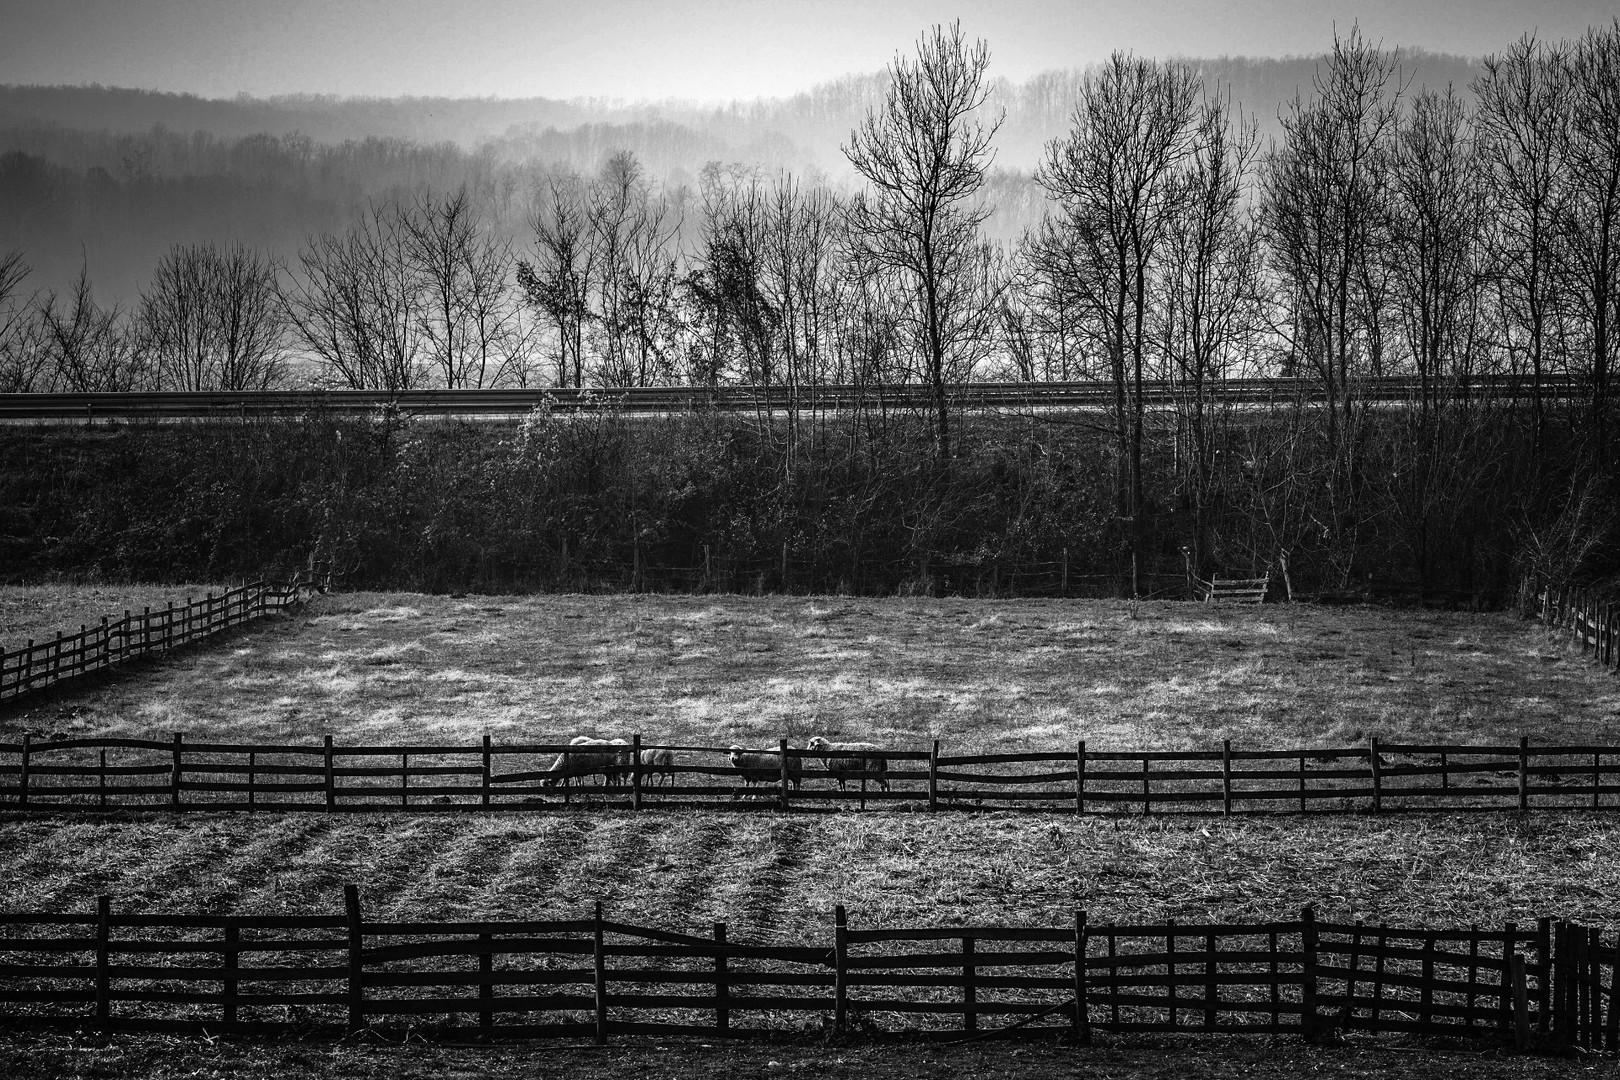 Iza ograda